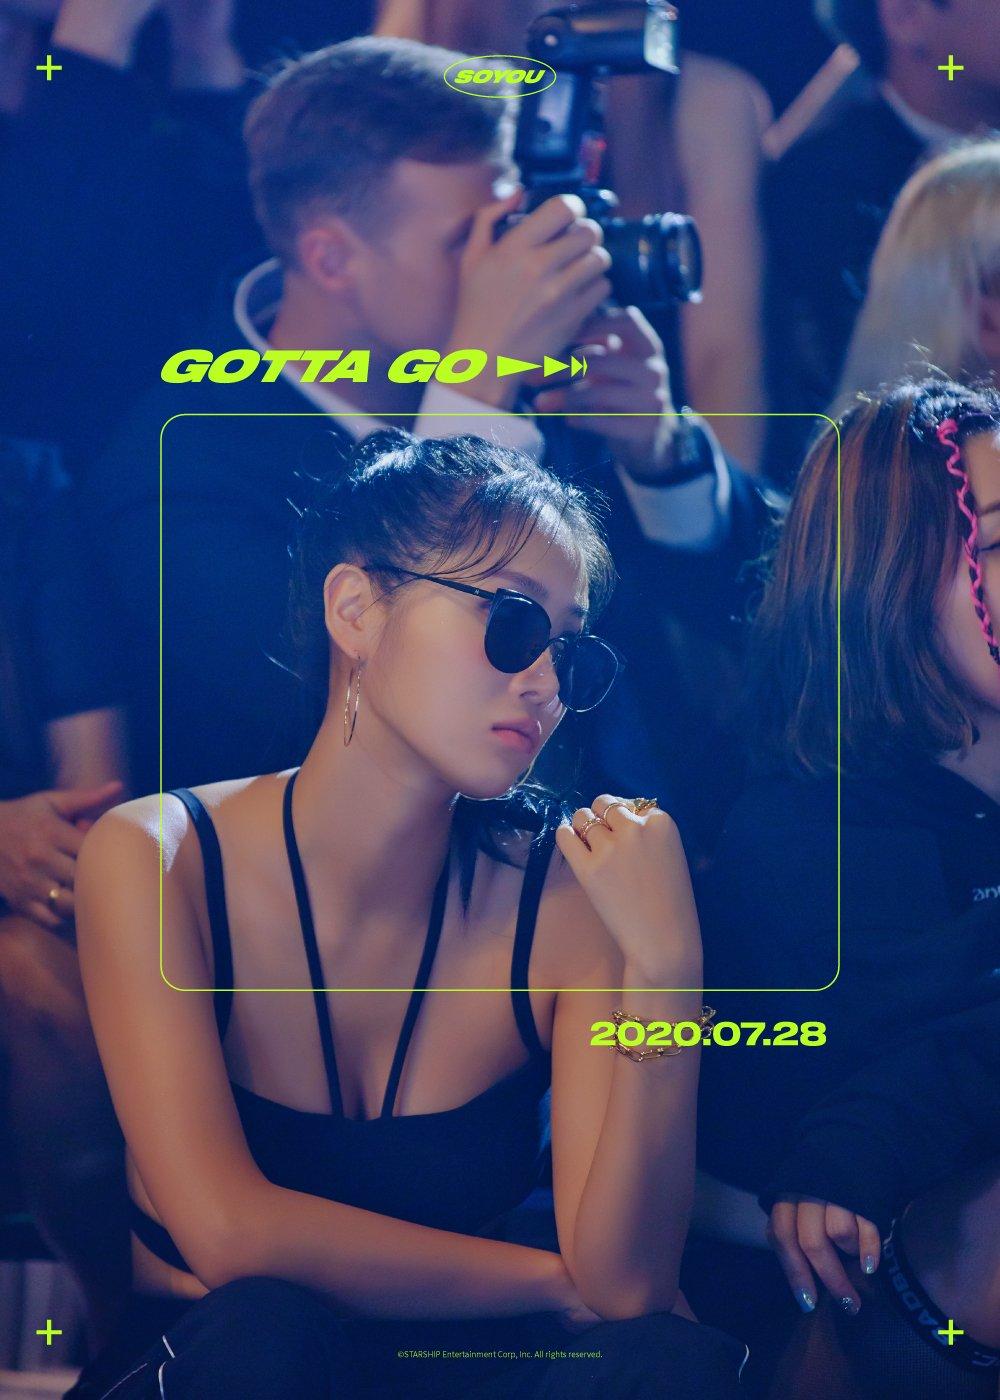 soyou-2nd-mv-comeback-teaser-gotta-go-1